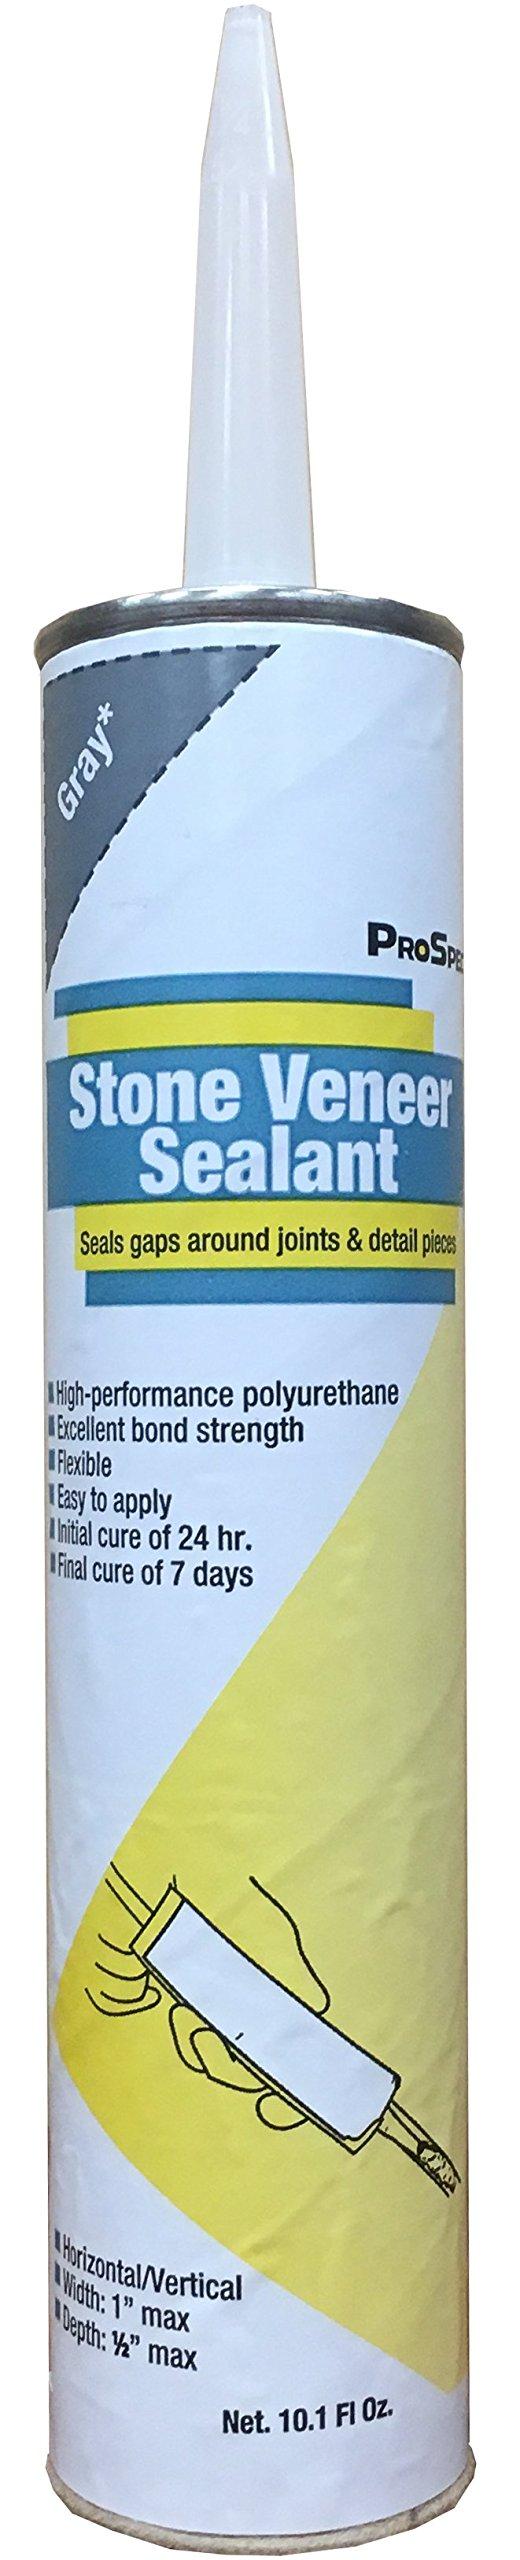 ProSpec Stone Veneer Sealant - Gray - 10.1 oz. (12 Pack) by ProSpec